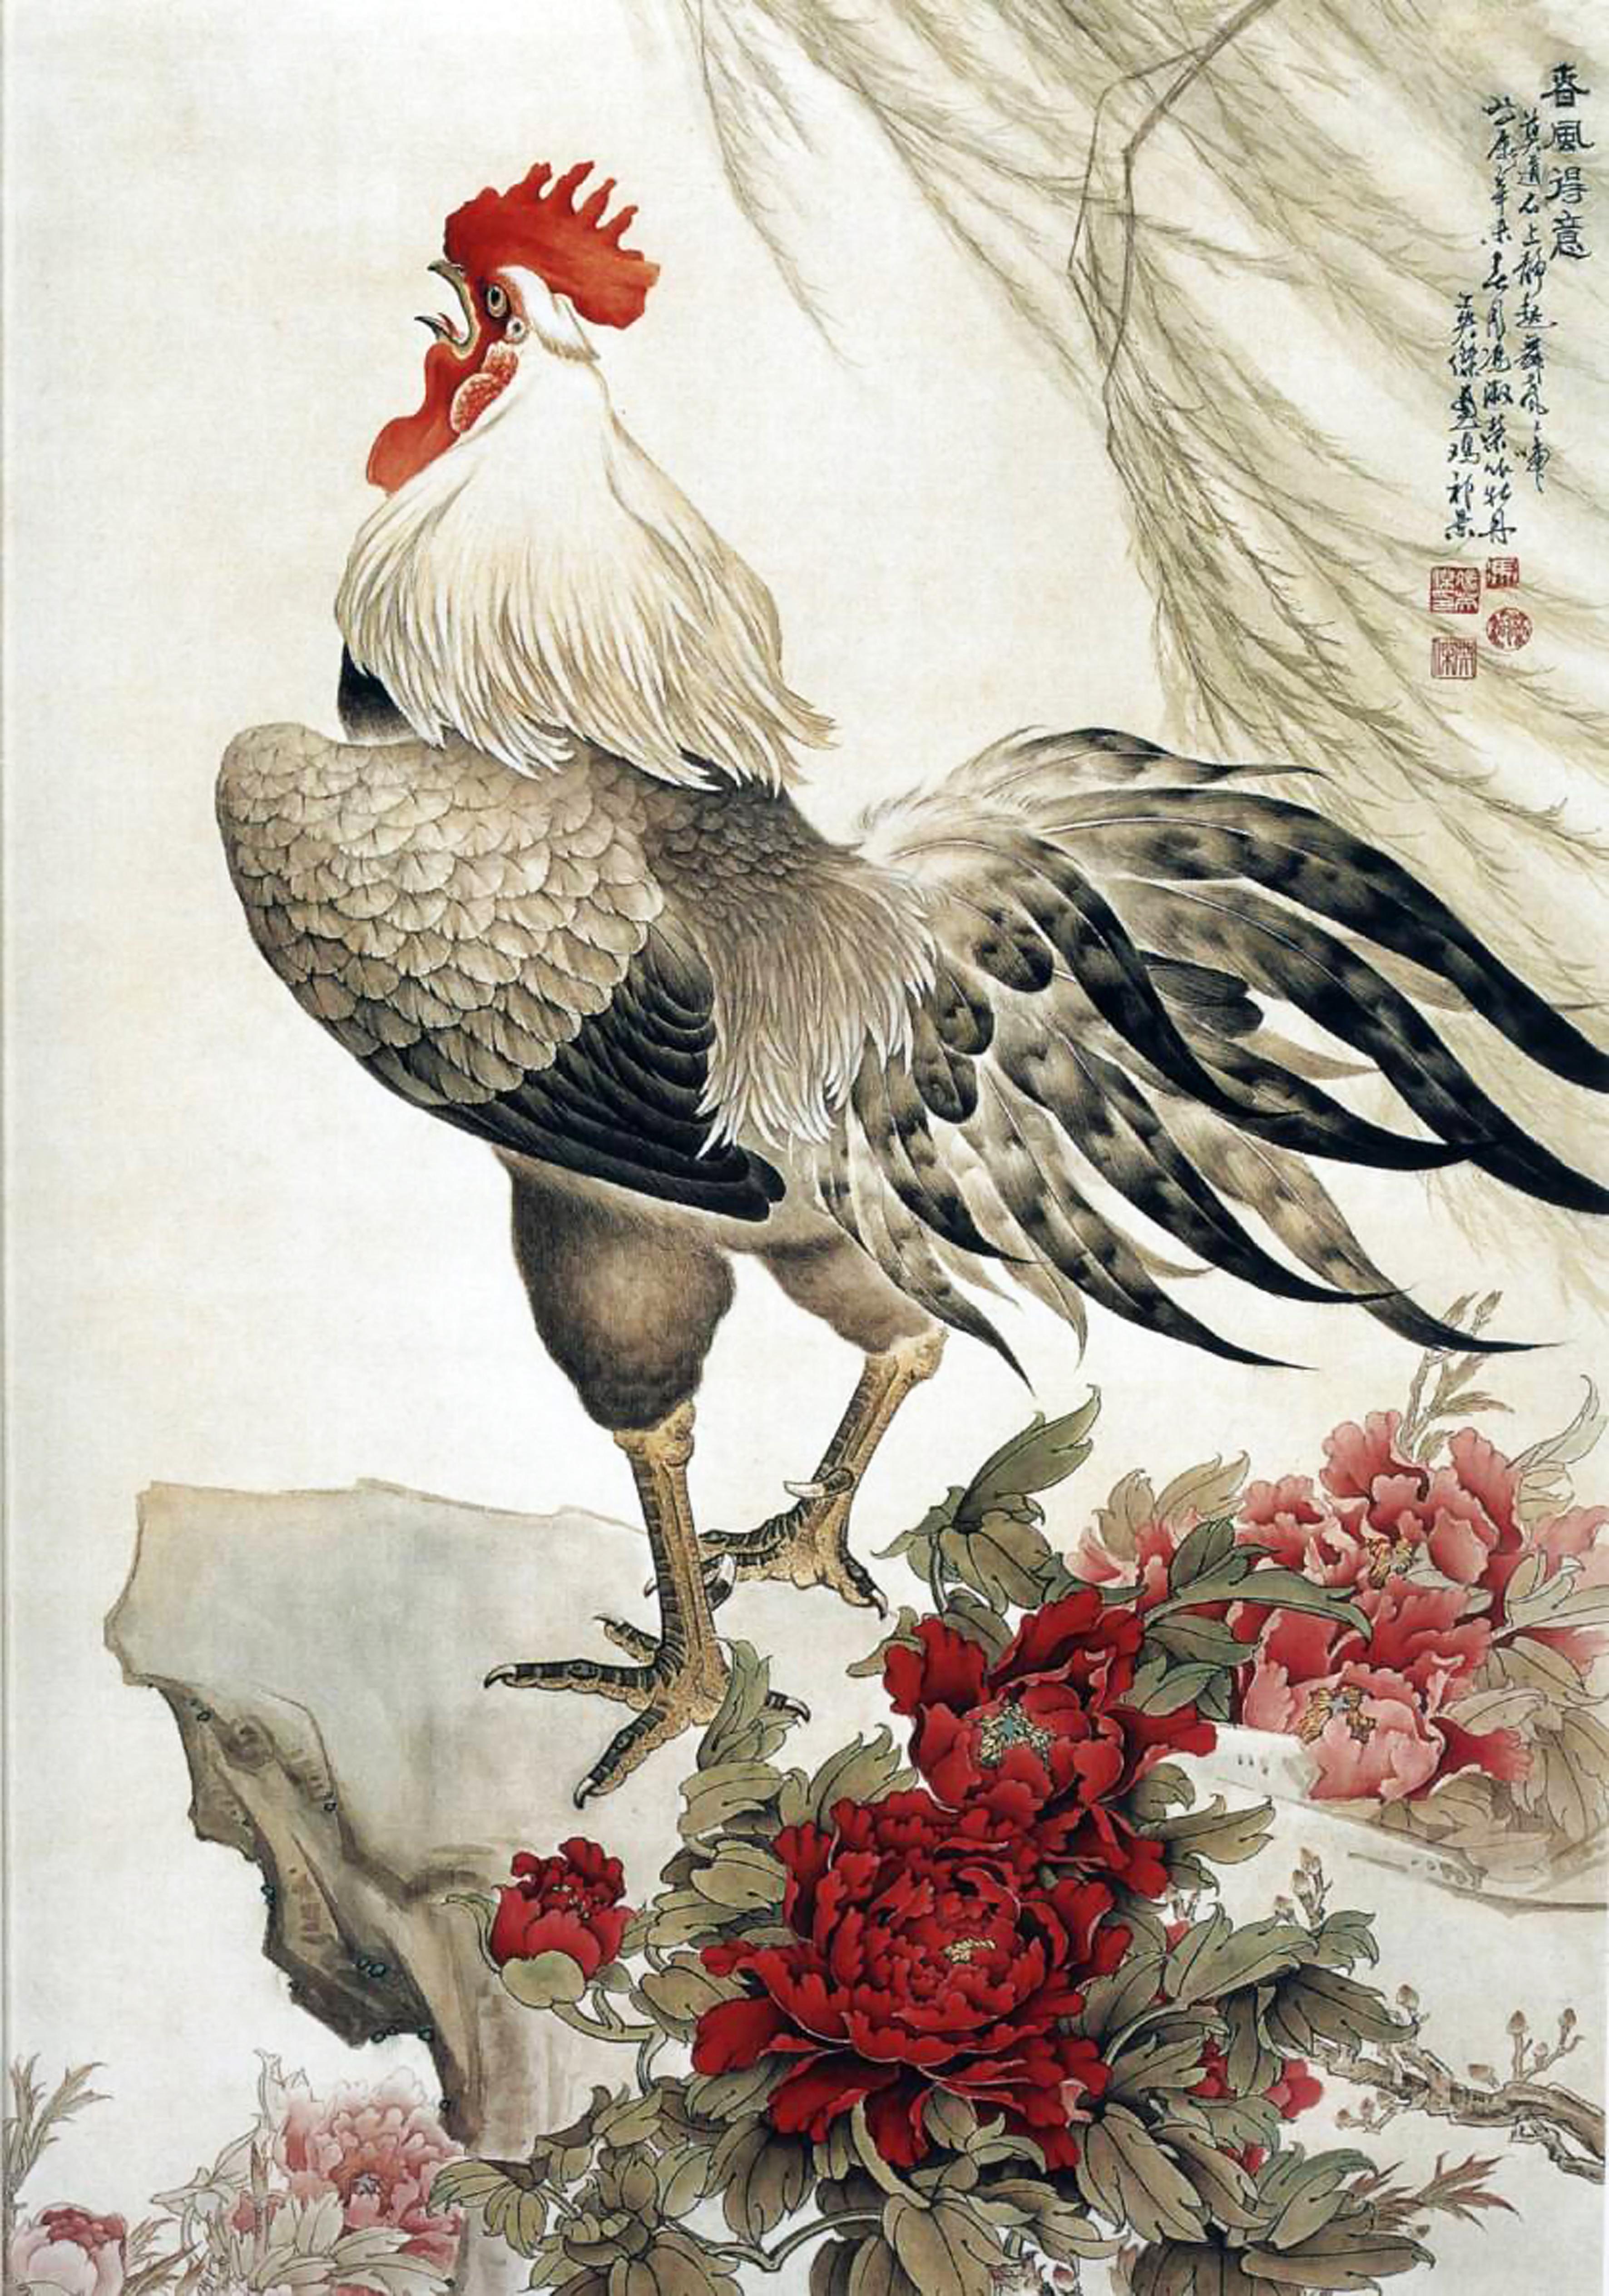 Картинки курица и петух с цыплятами